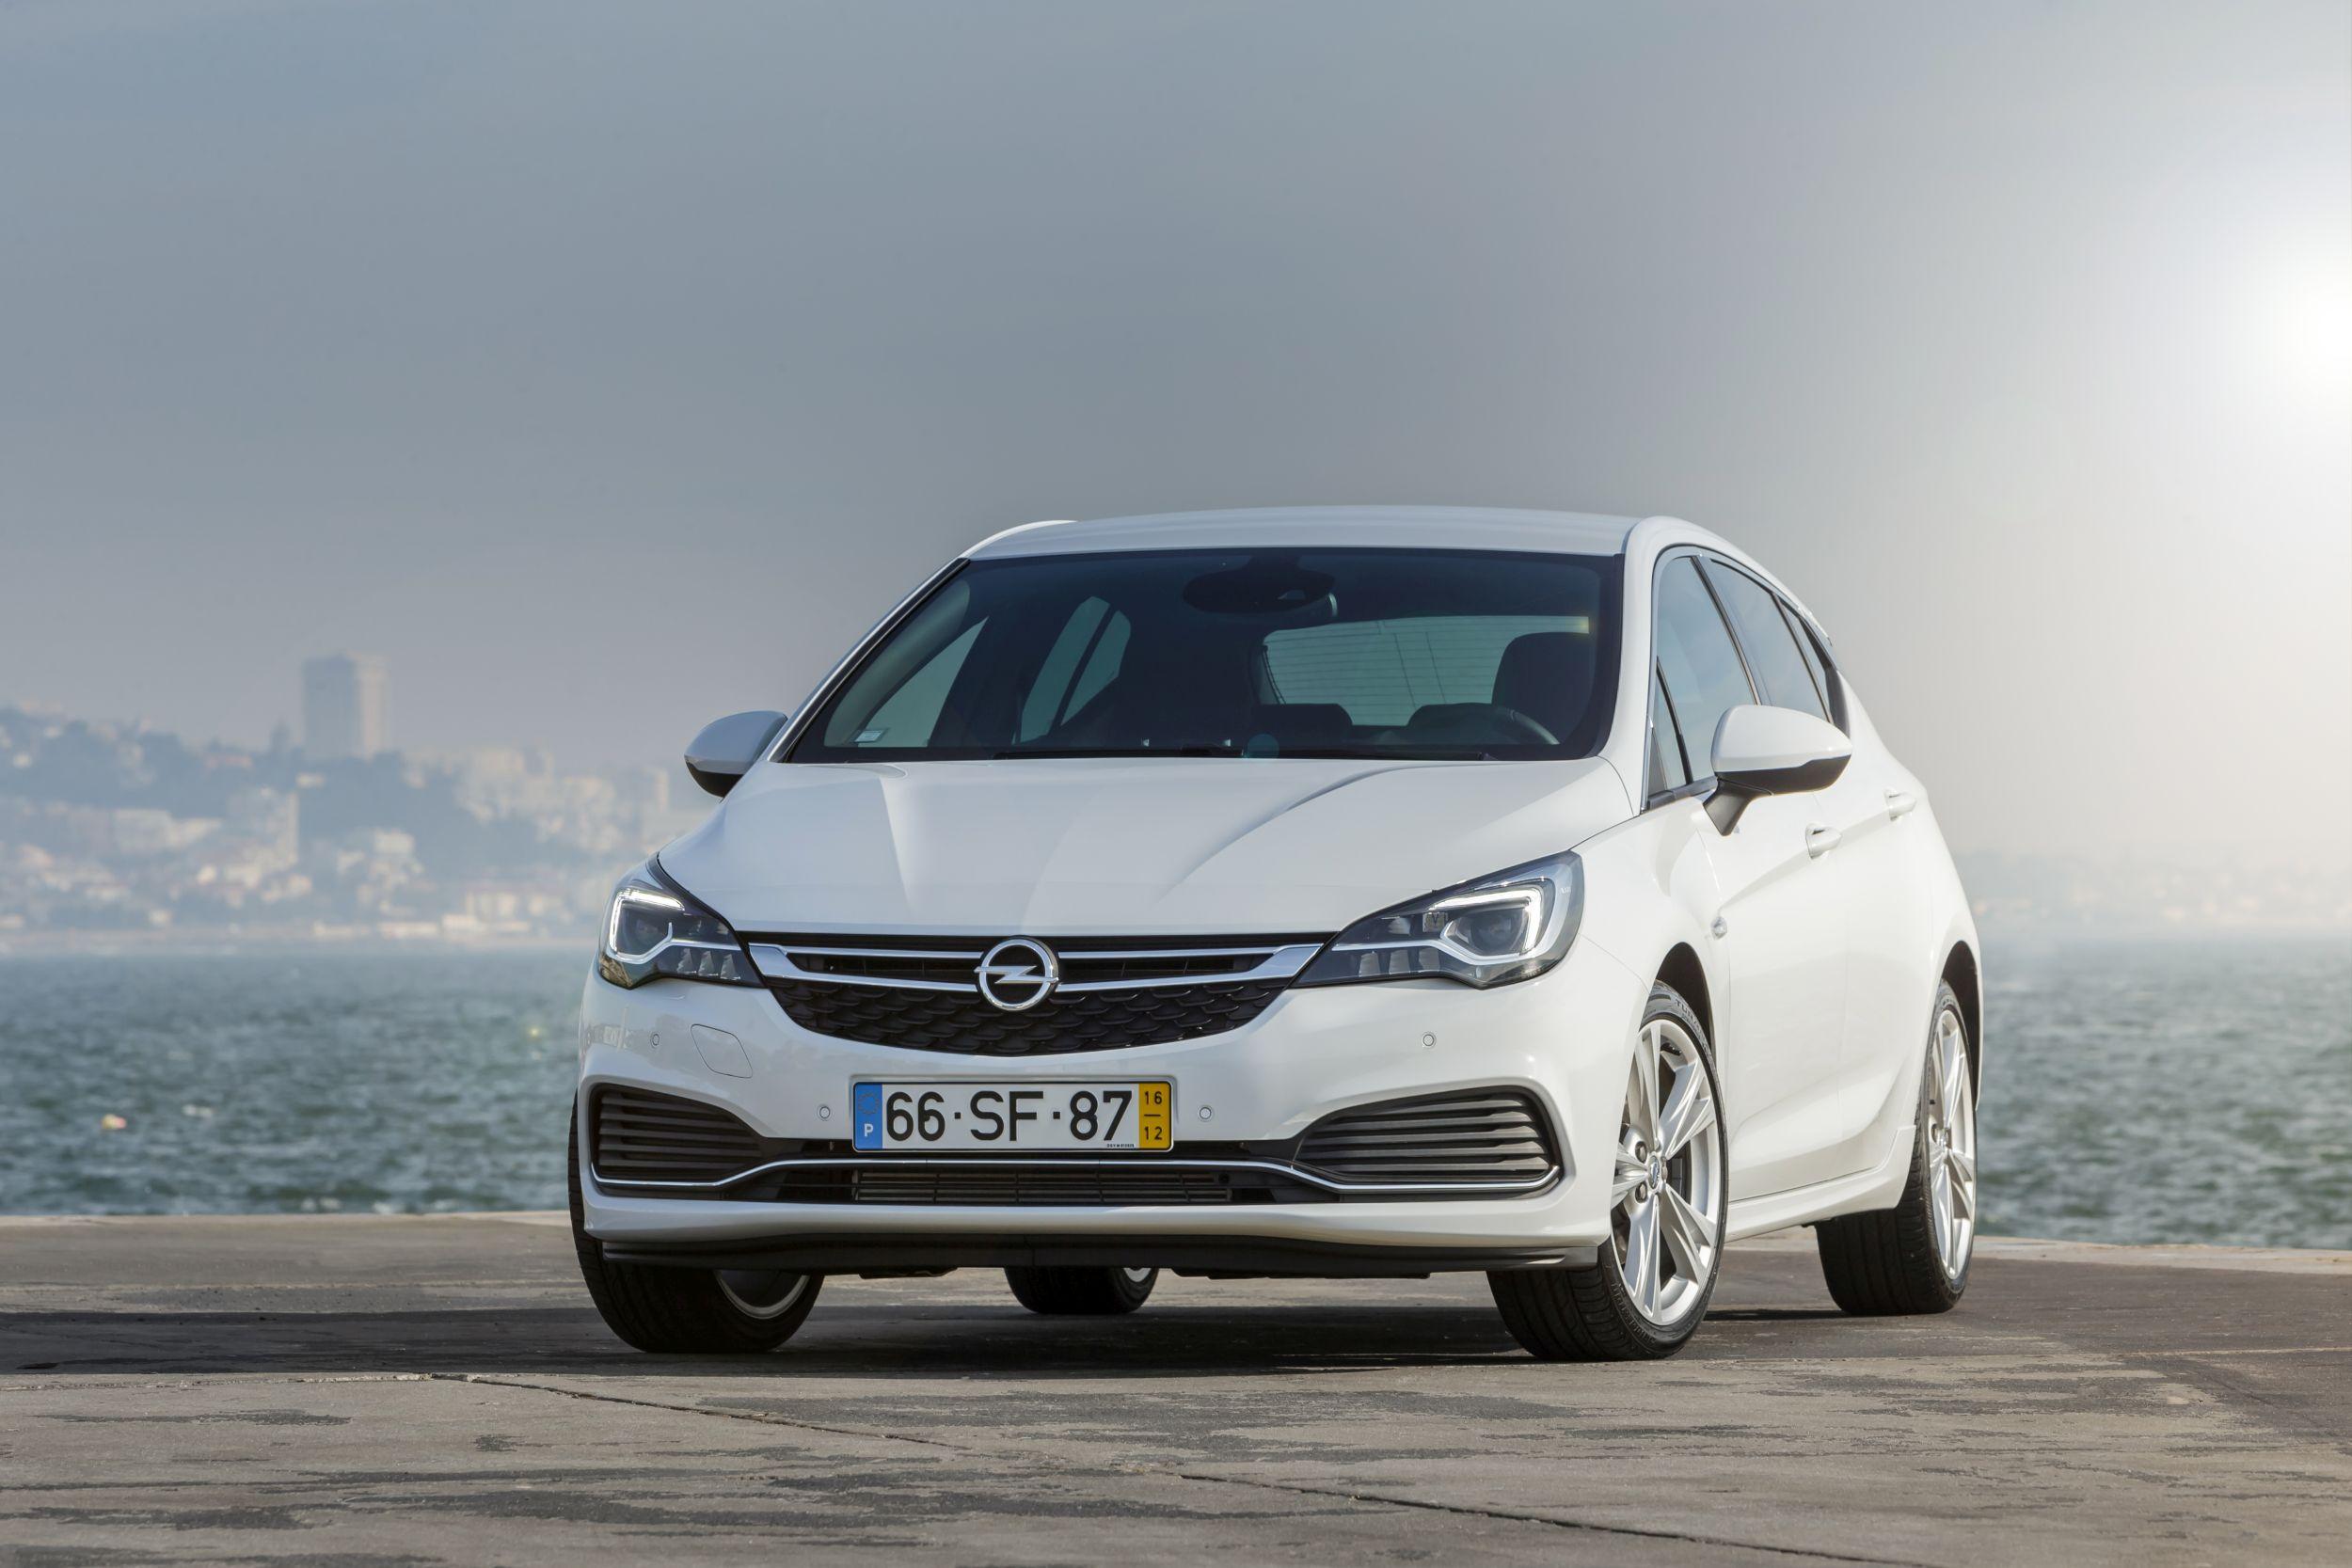 Opel Astra 299528 Opc Line